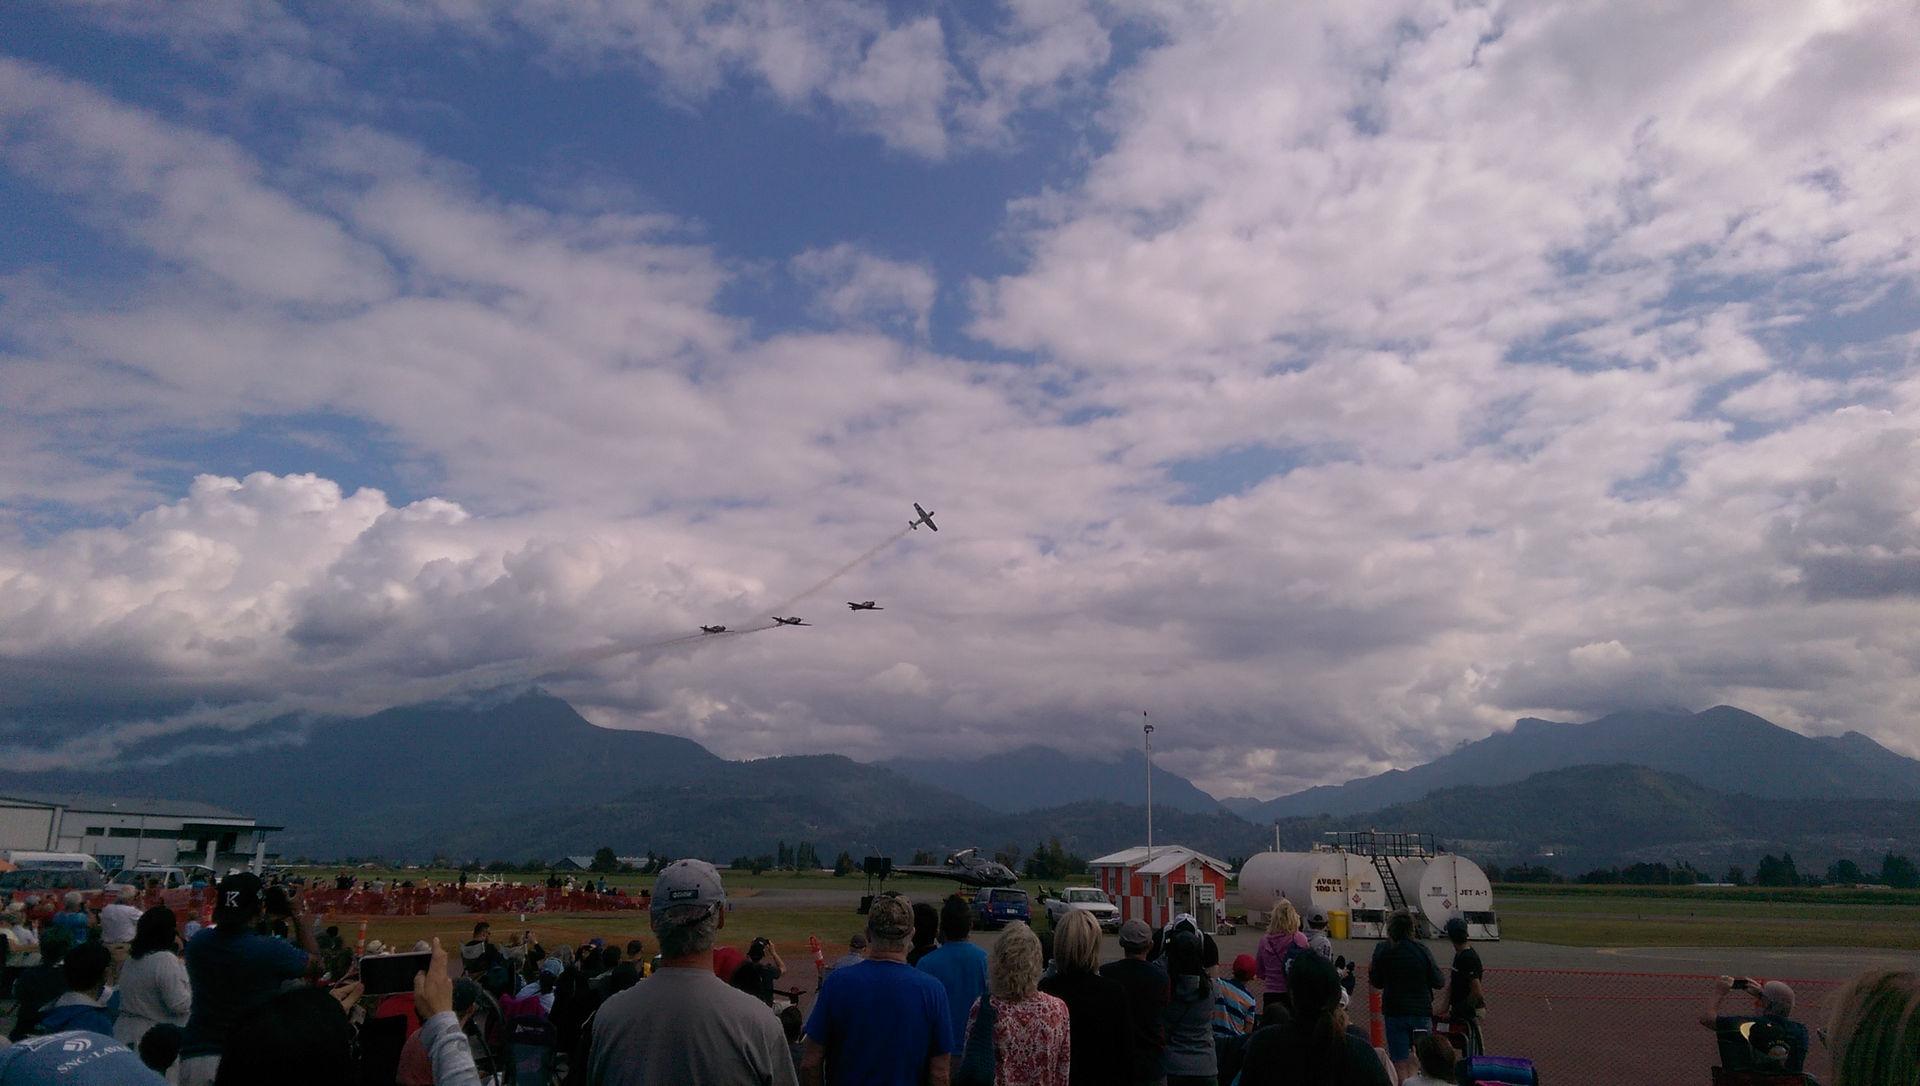 Chlliwack Flight Festival airshow